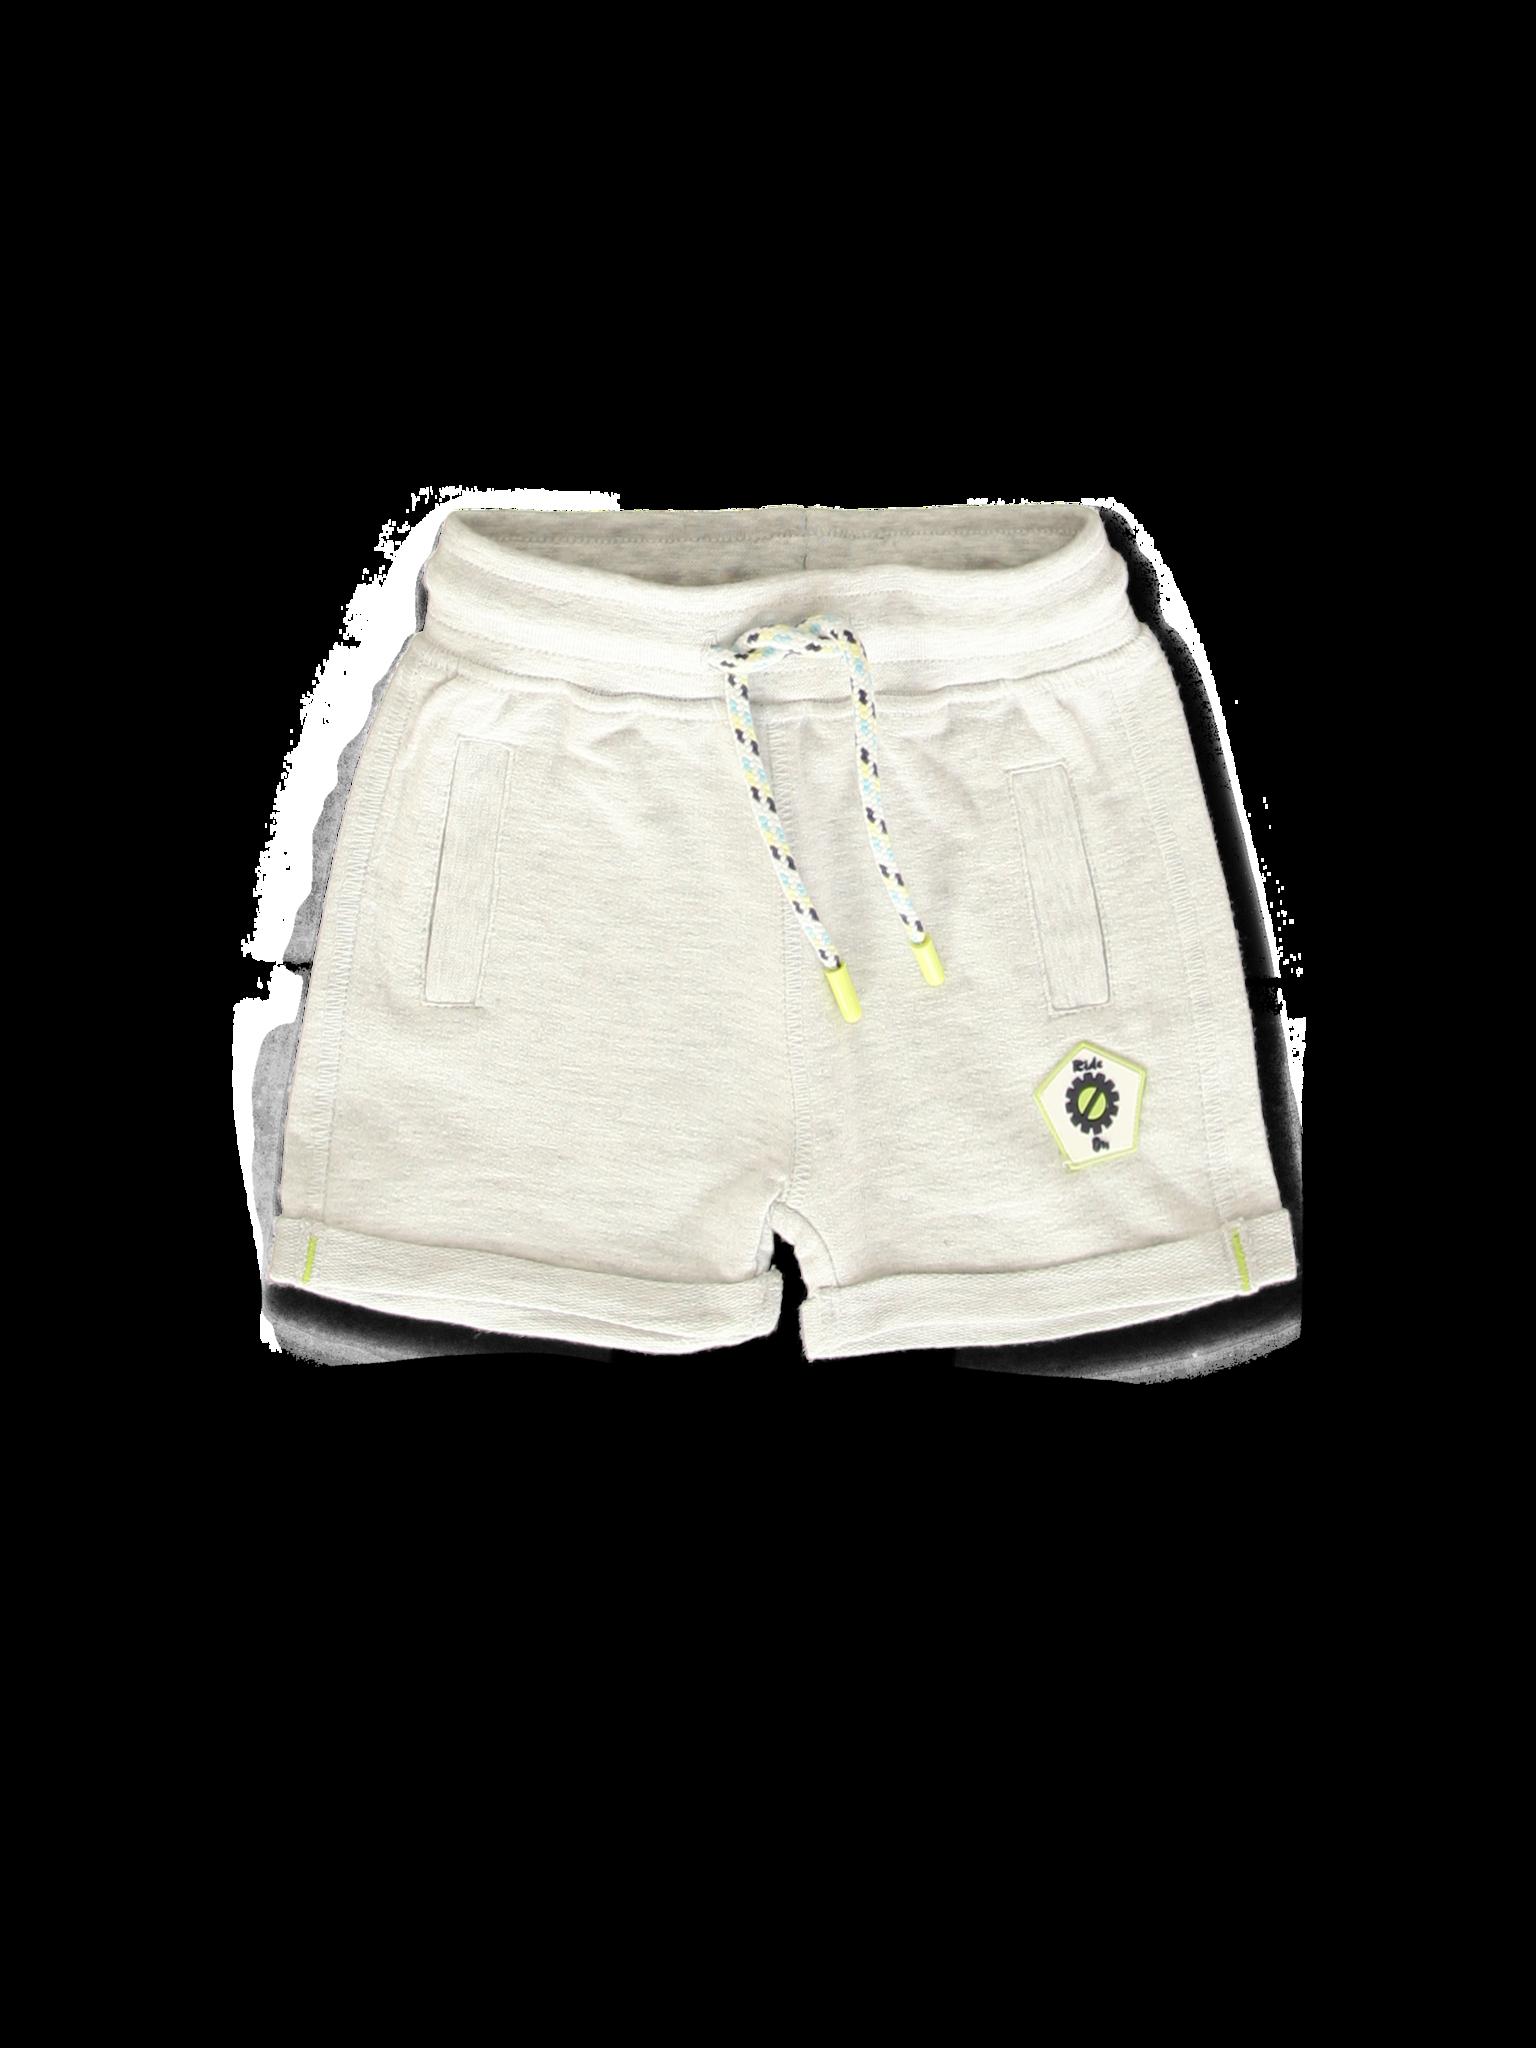 All Brands   Summerproducts Baby   Shorts   8 pcs/box